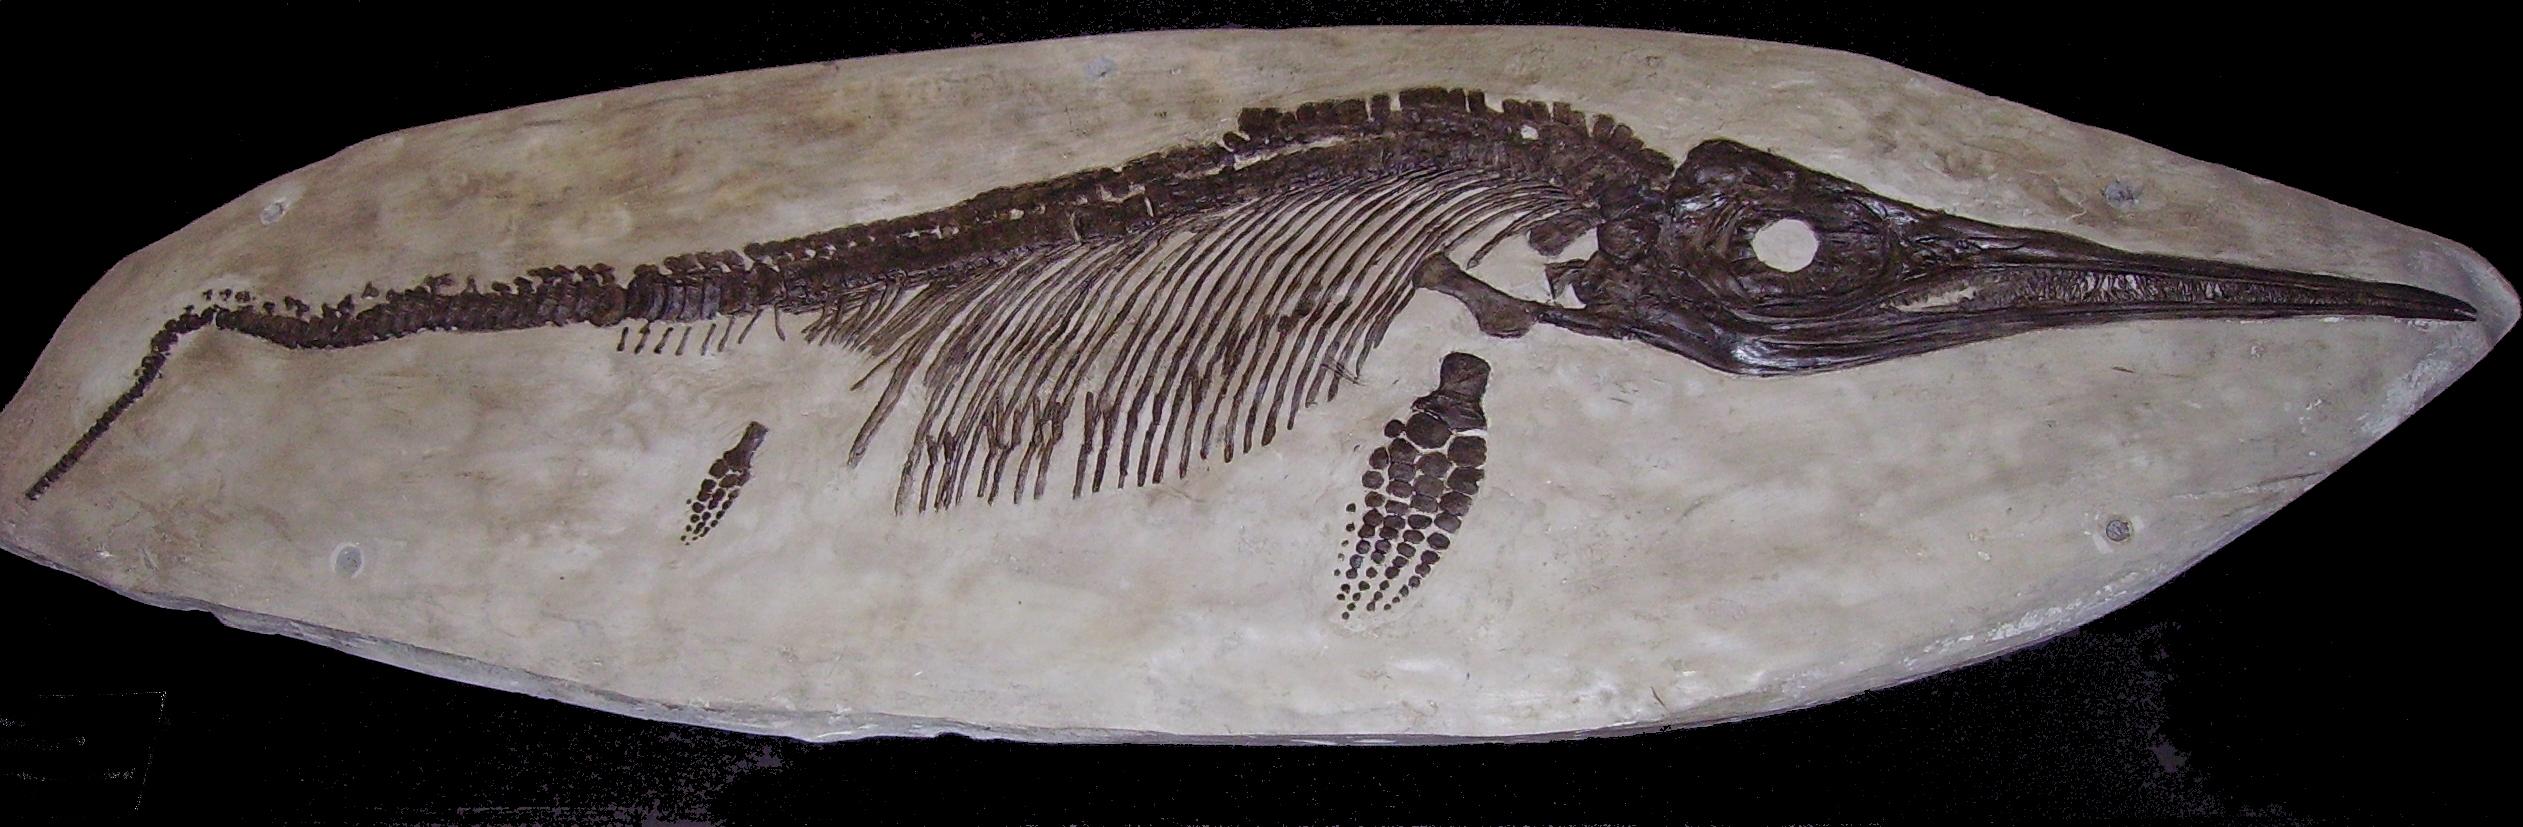 ichthyosaur fossil - photo #2